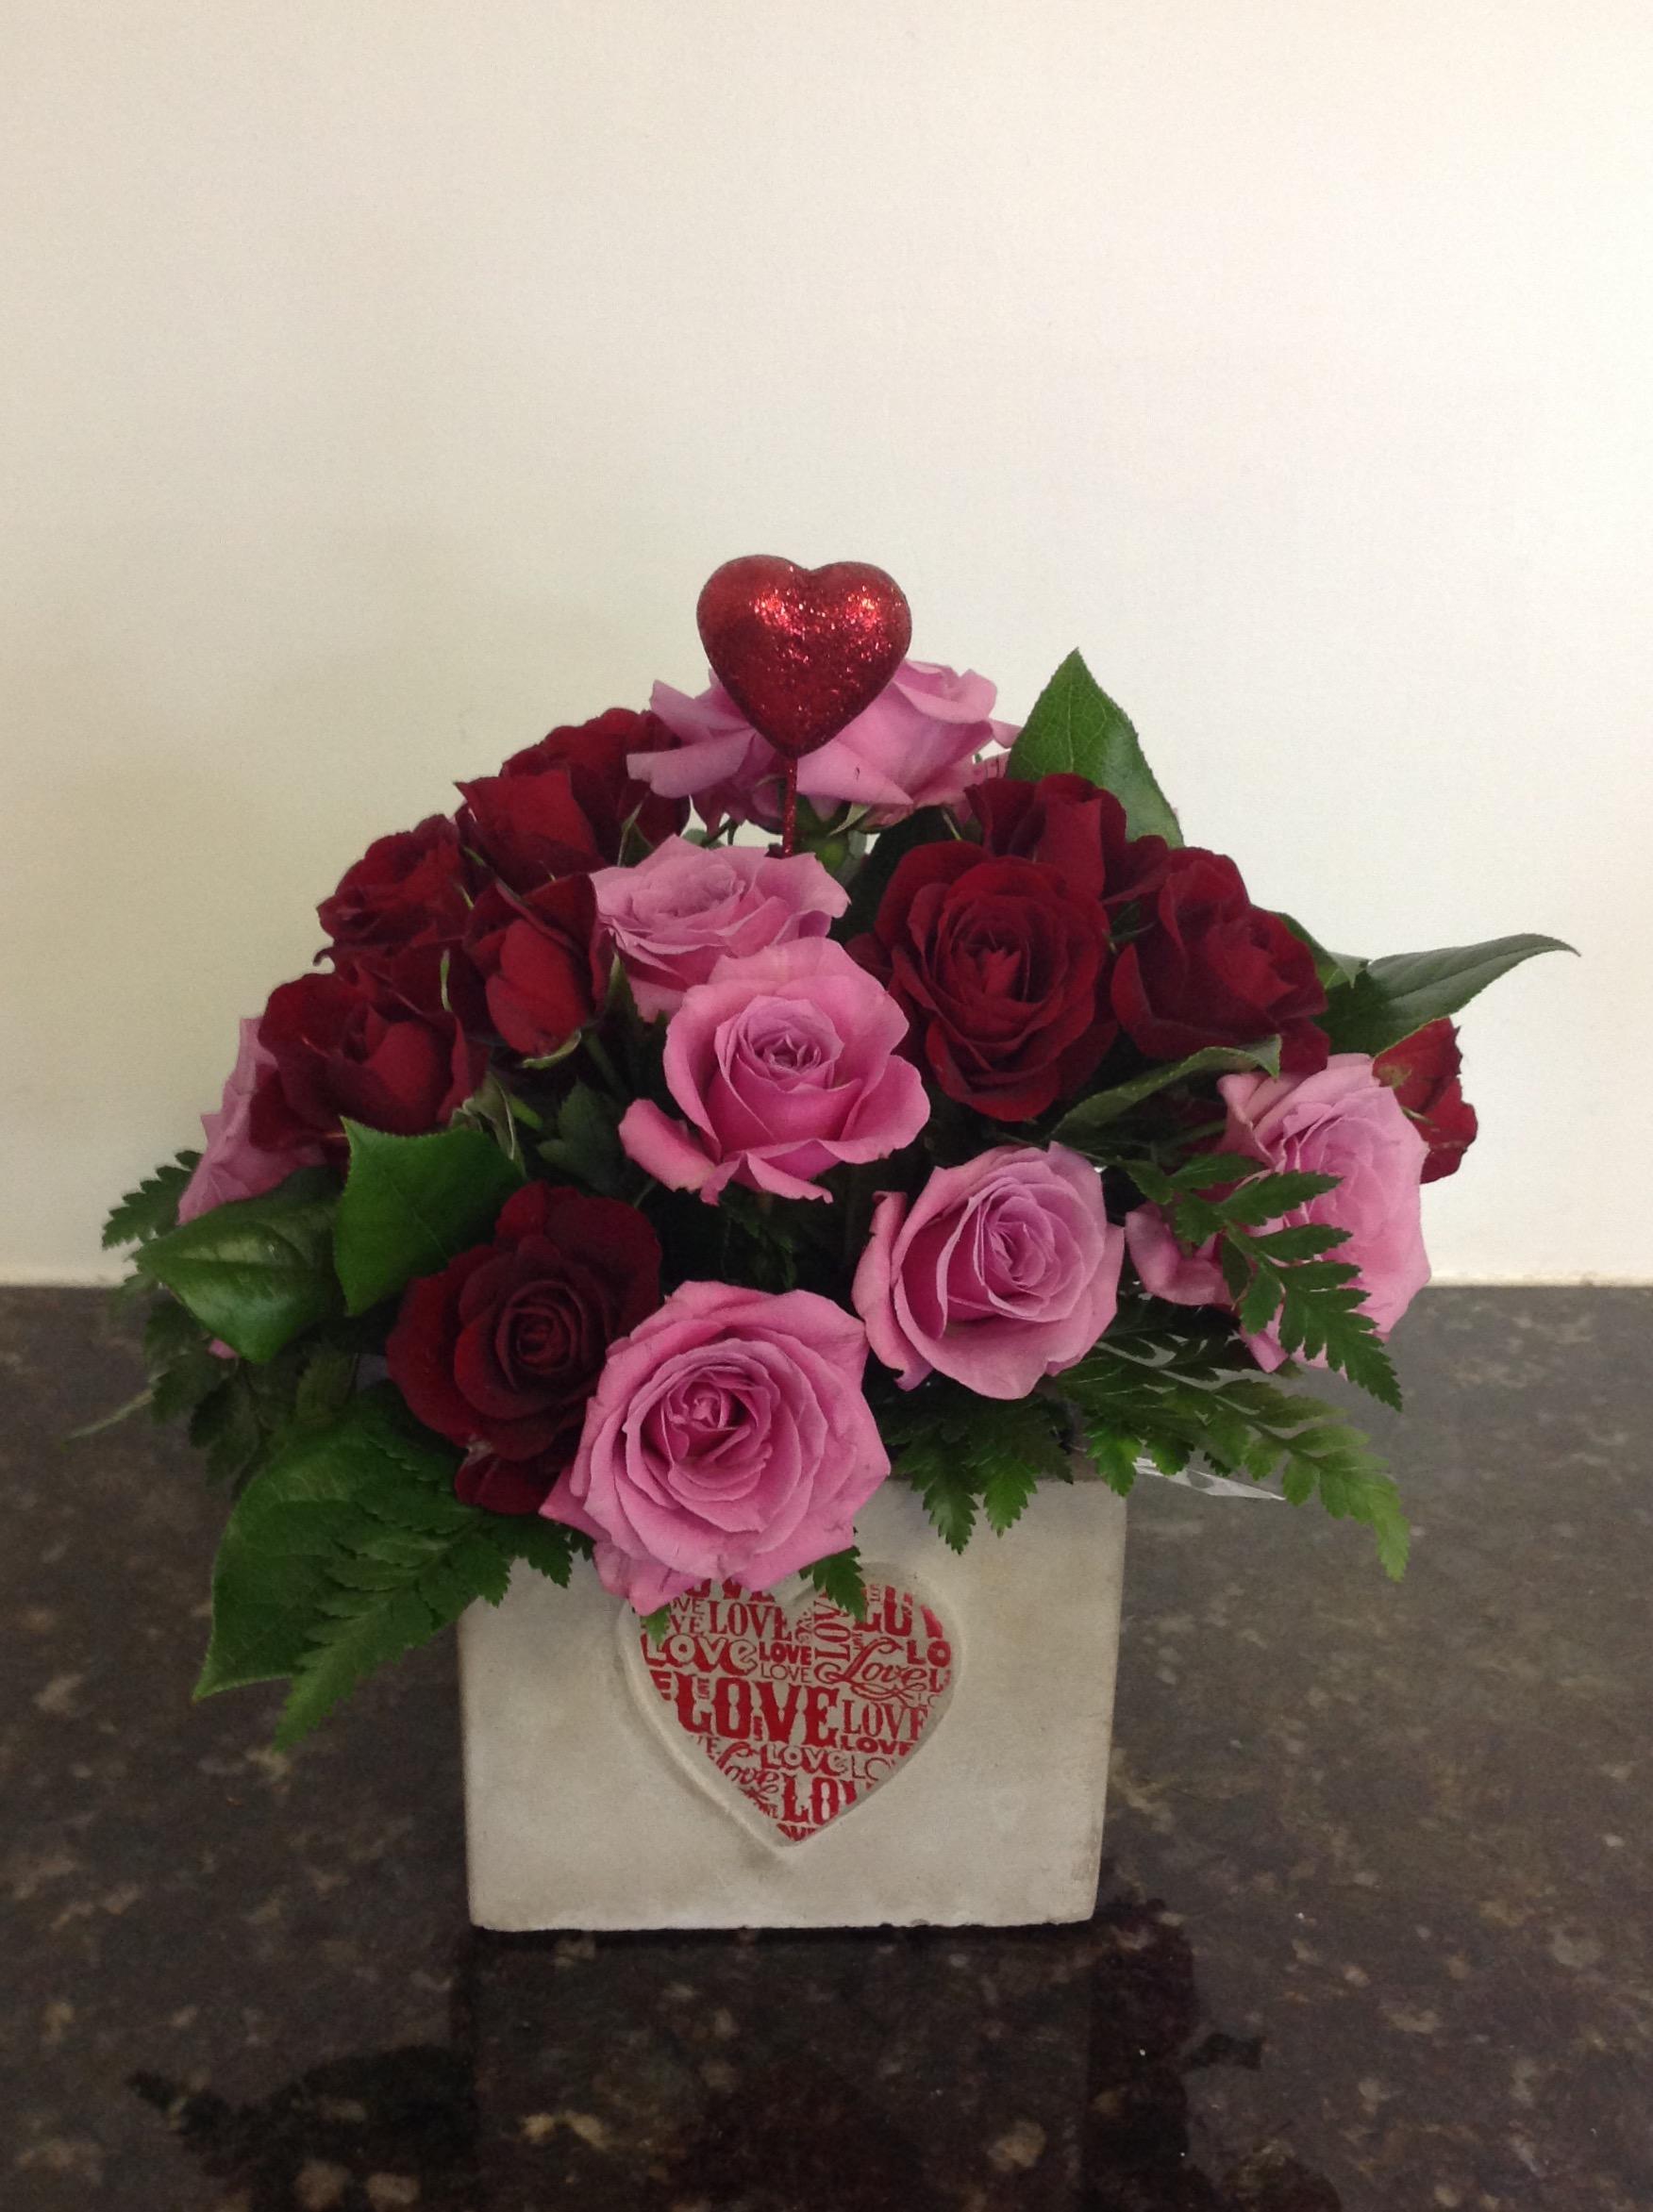 Sweetheart Spray Roses - $50 -